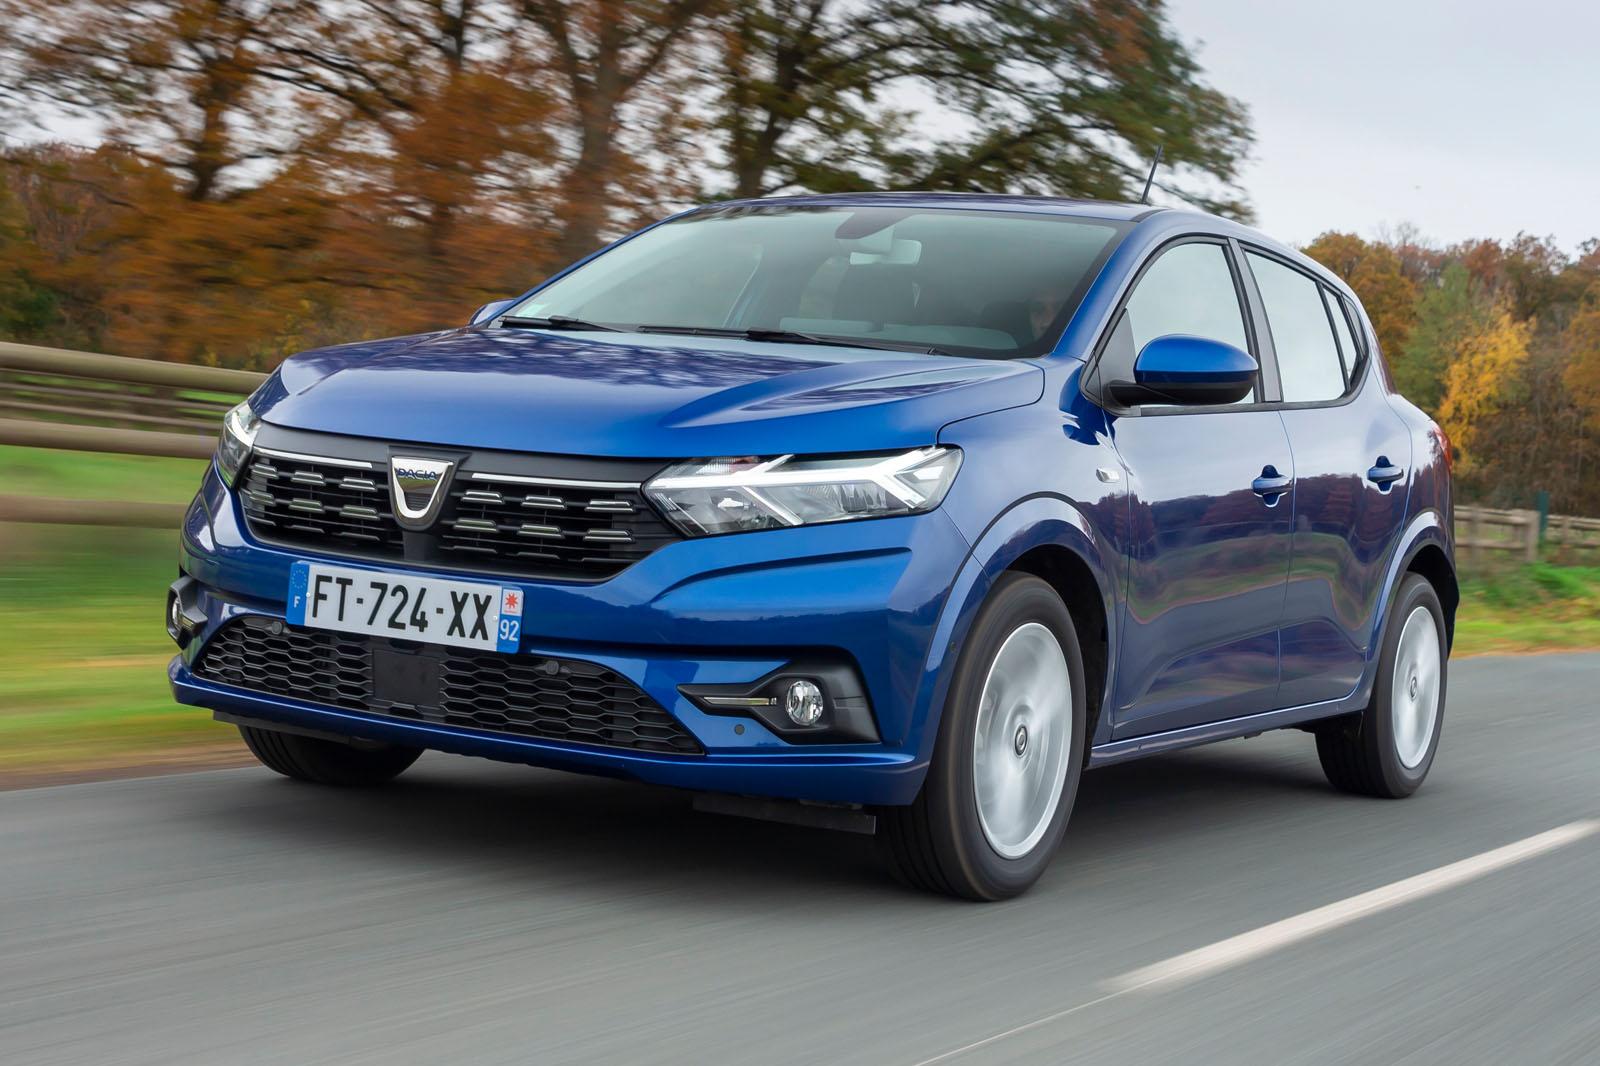 New Dacia Sandero: UK's cheapest car on sale at £7995 ...